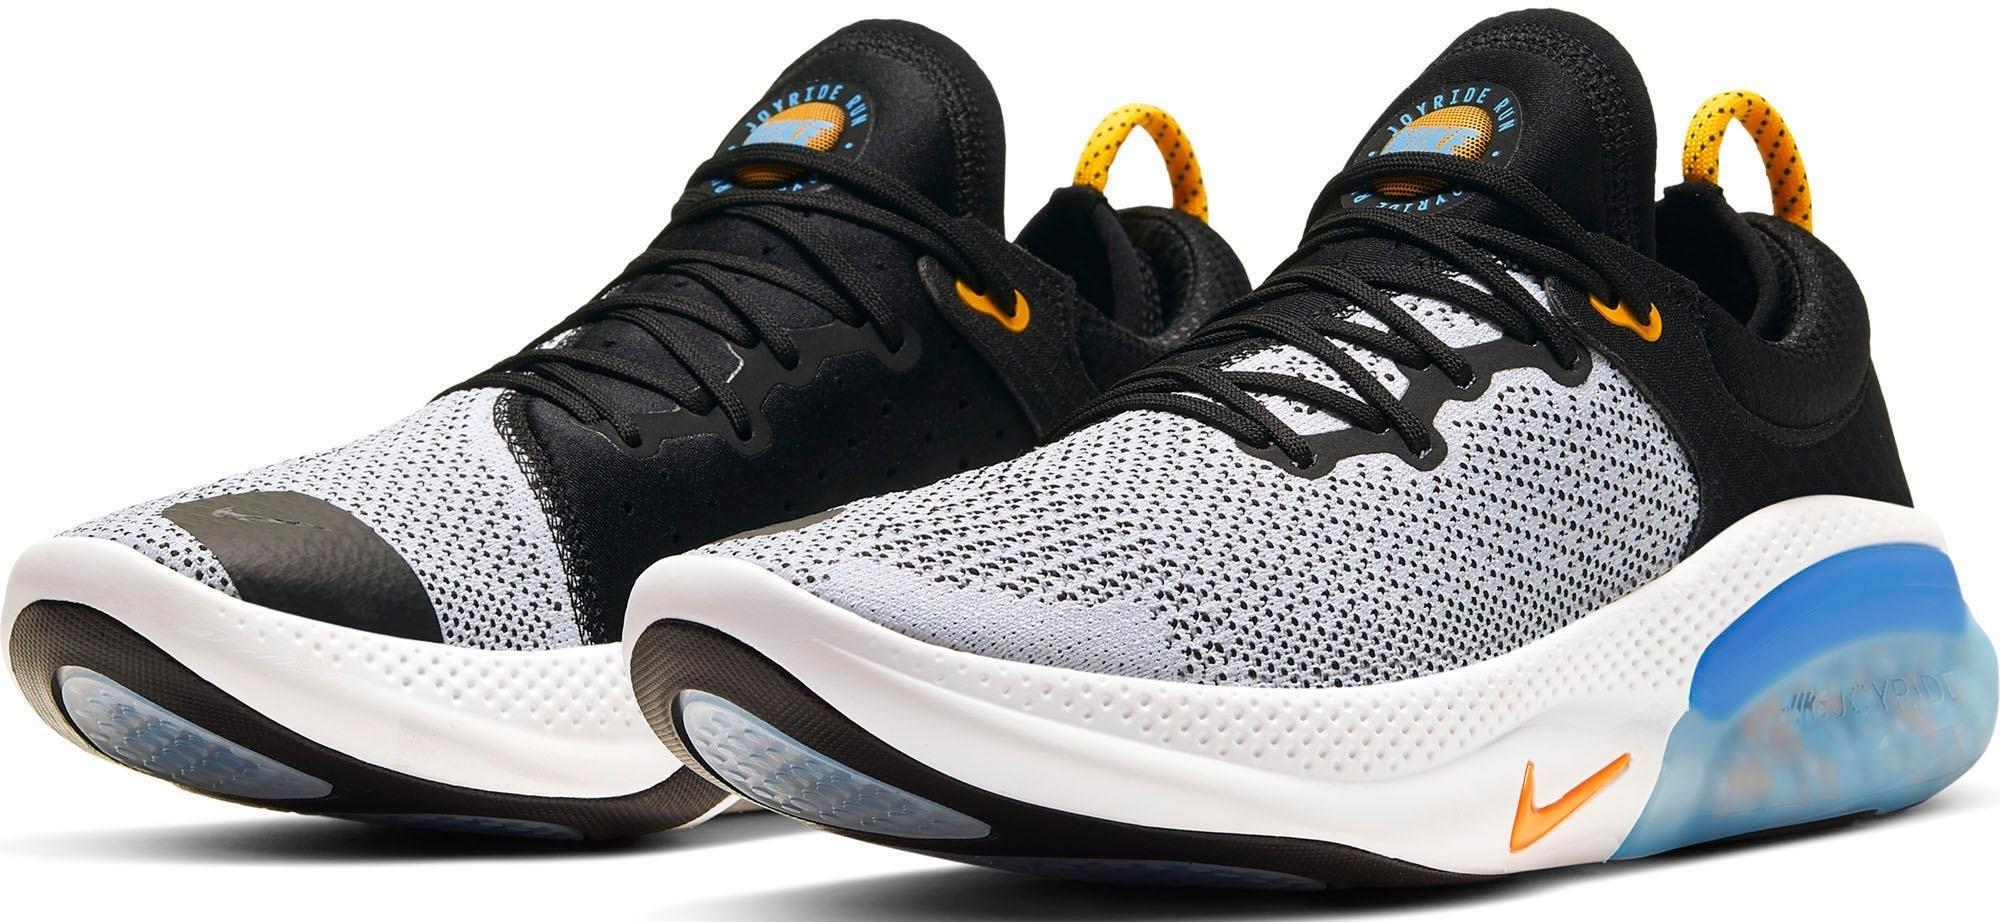 Nike runningschoenen »Joyride Run Flyknit« bij OTTO online kopen